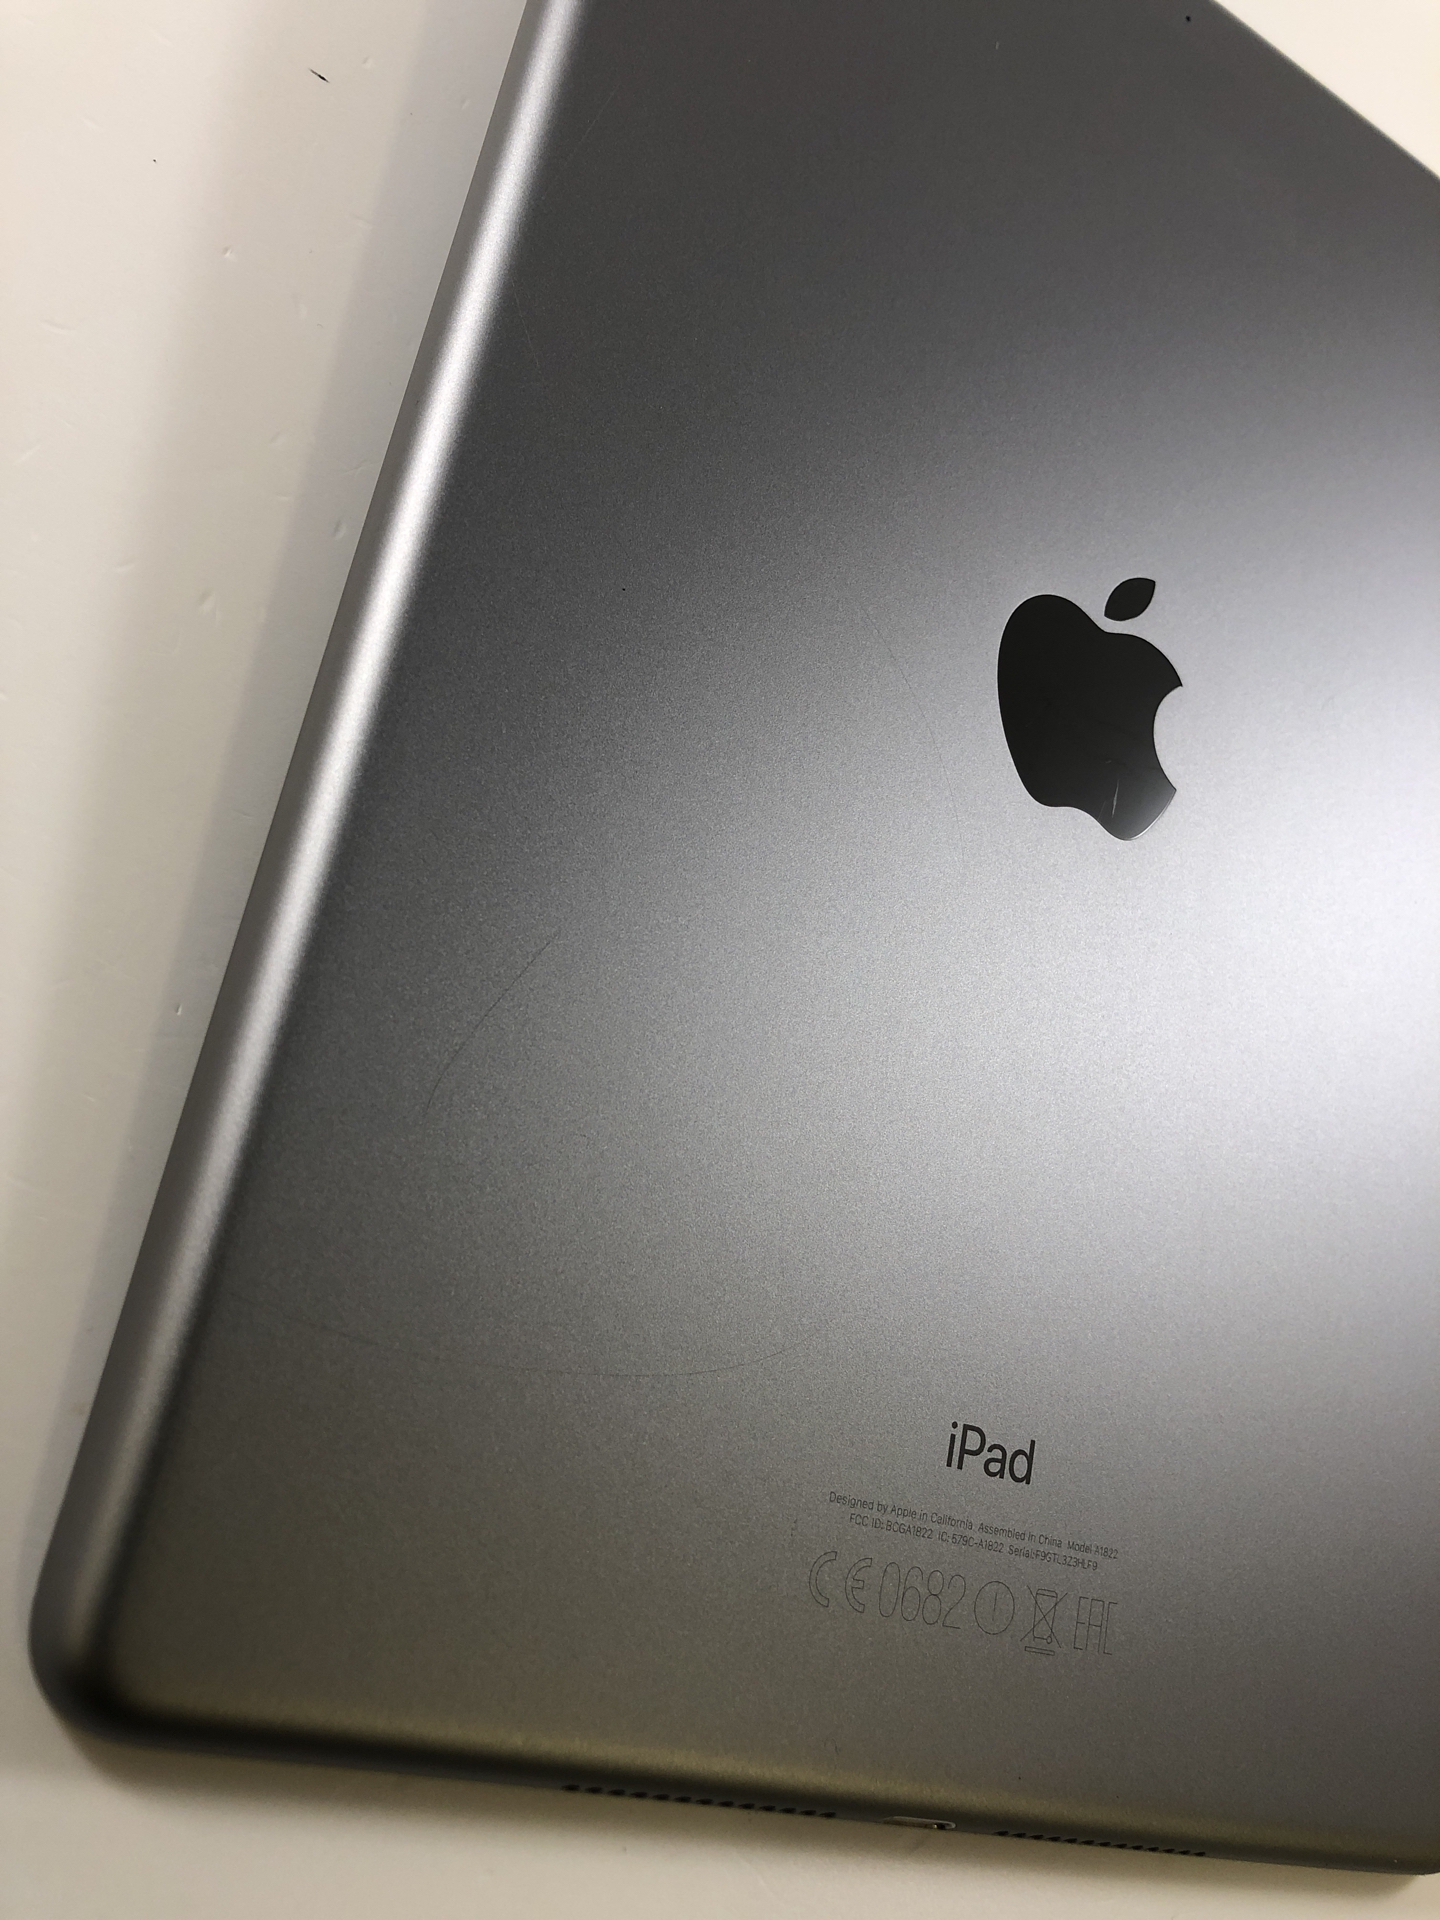 iPad 5 Wi-Fi 32GB, 32GB, Space Gray, Bild 4